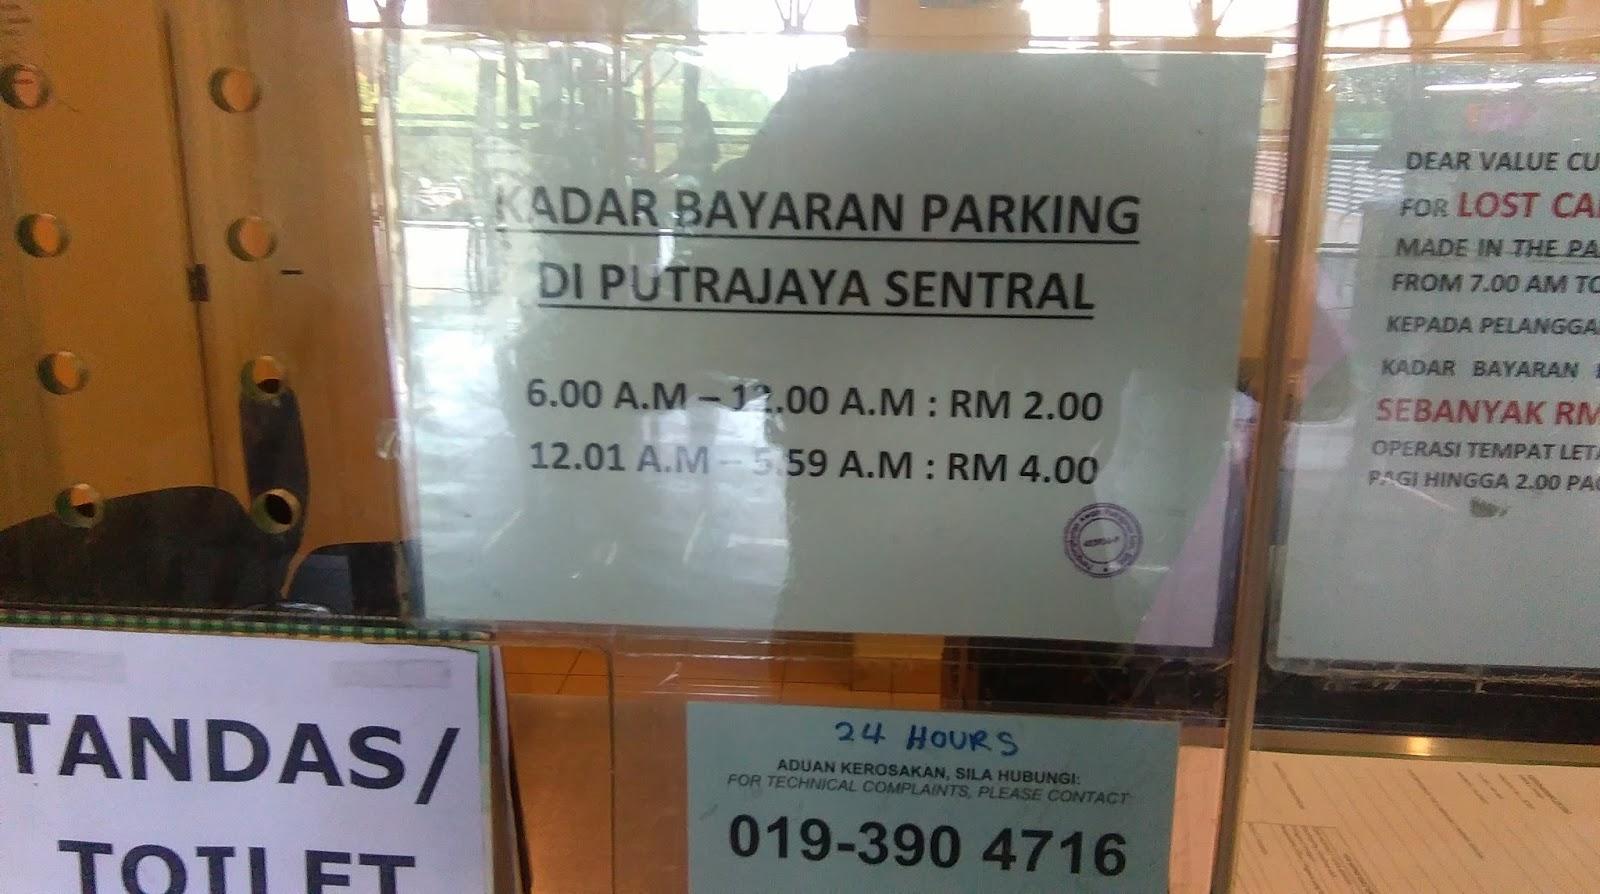 Mat Drat Cheap Parking To Klia Klia2 At Park N Ride Putrajaya Sentral